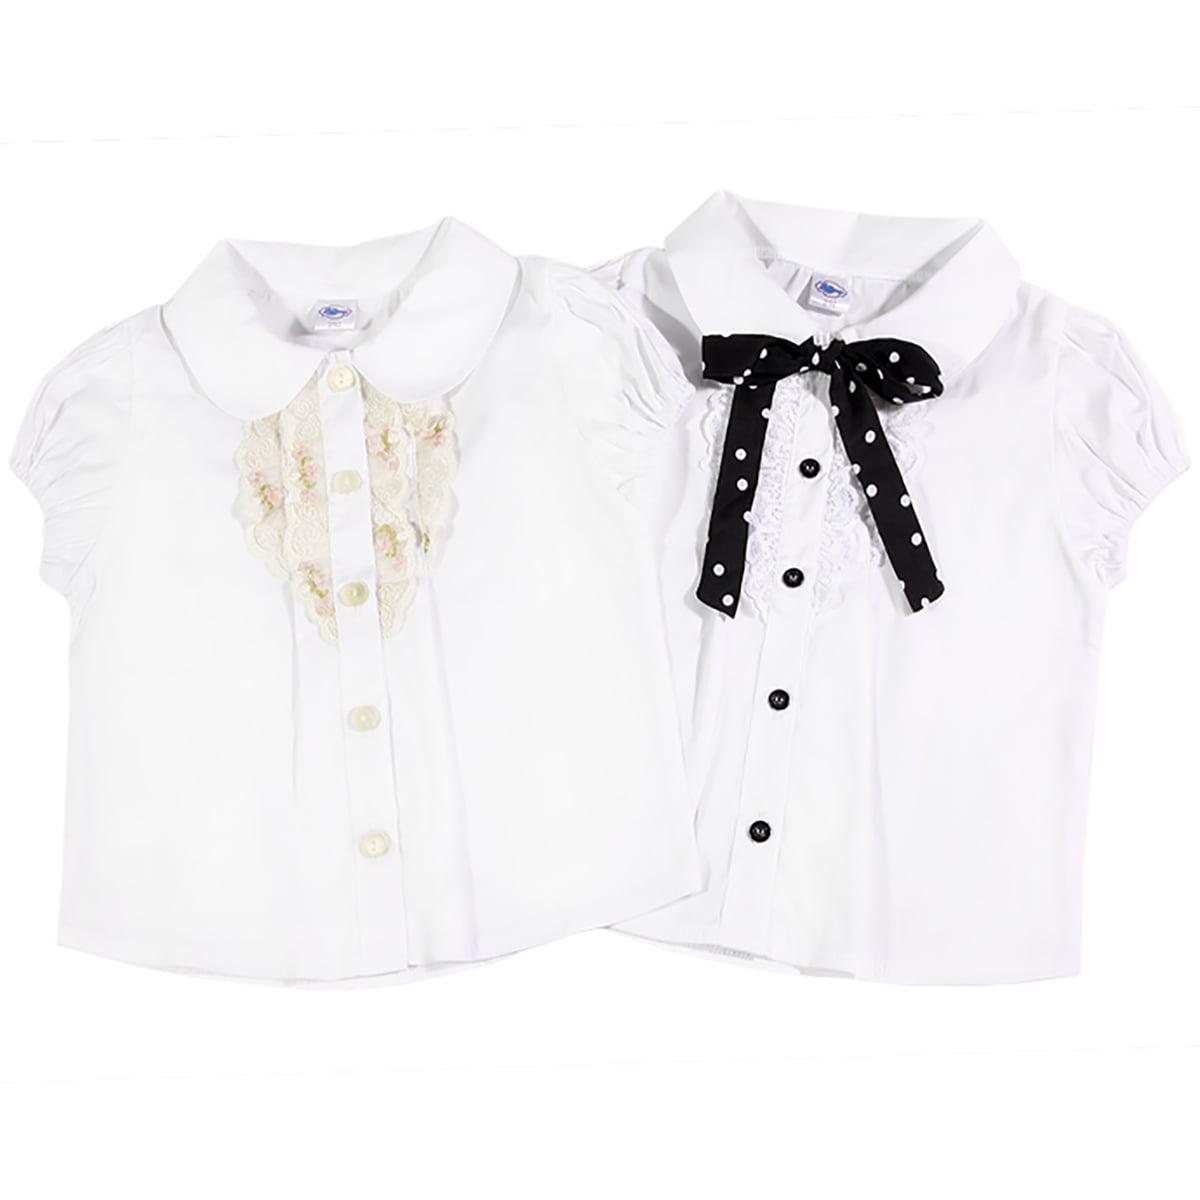 Starring blouse kolekcija